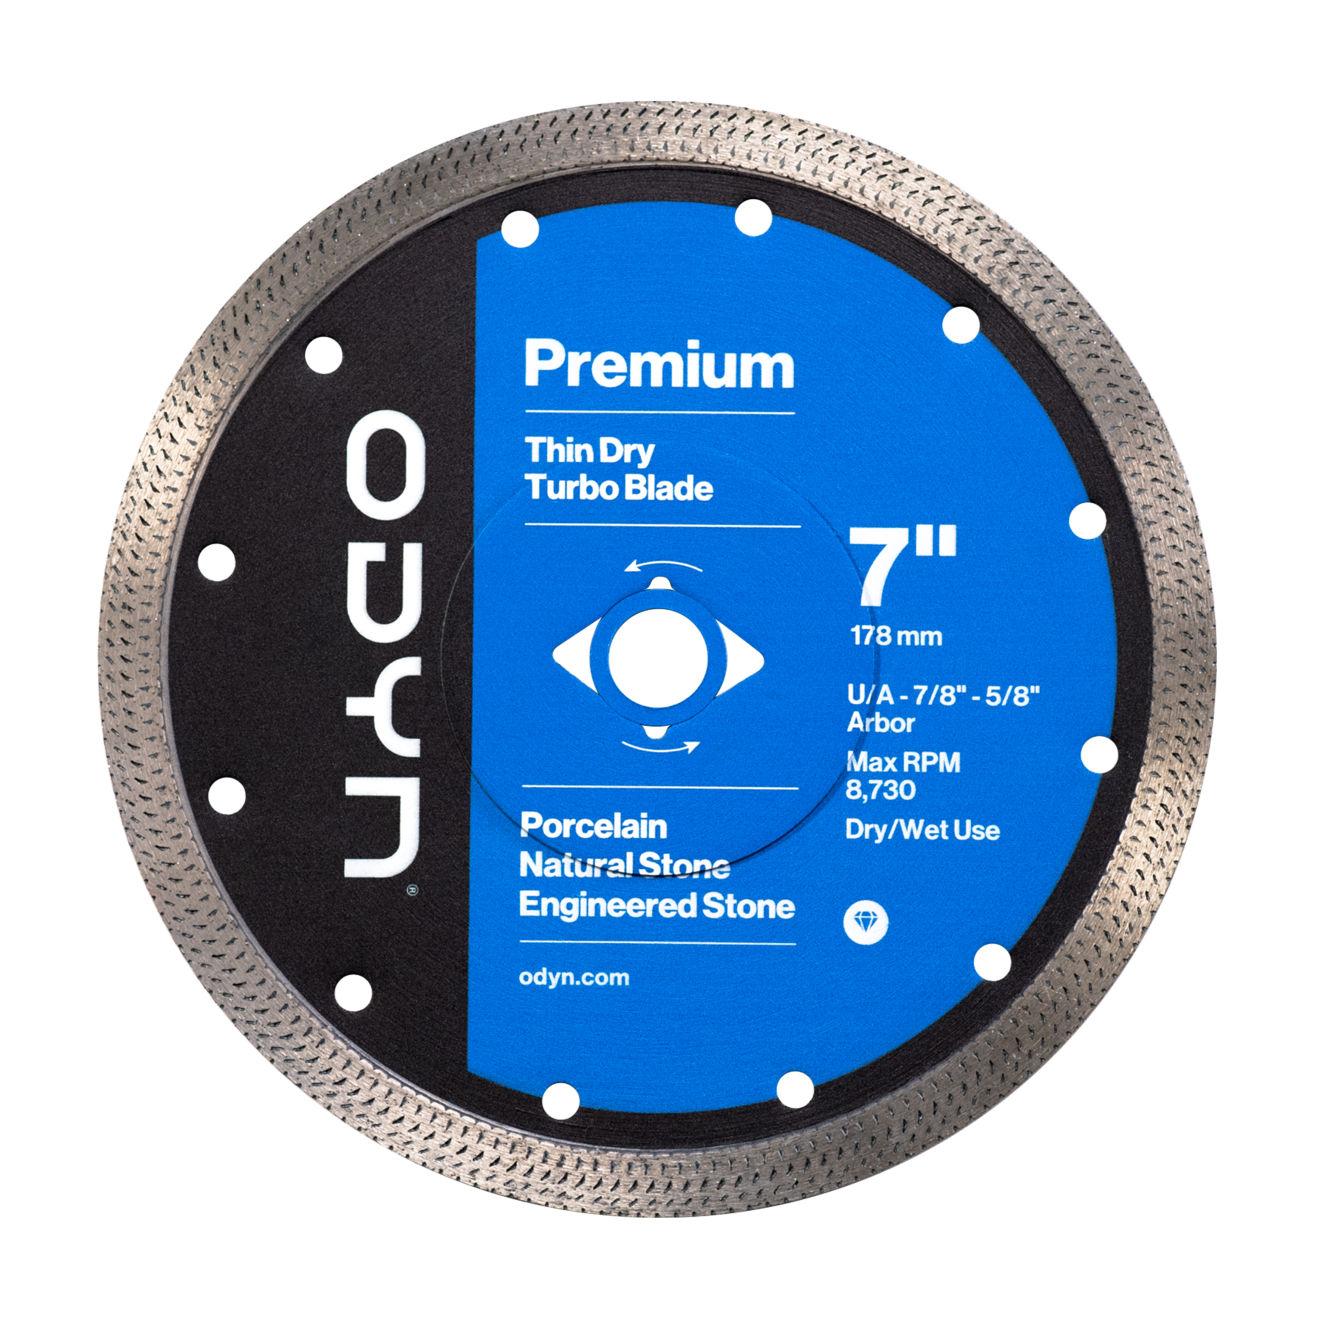 Odyn 7 in. Premium Thin Dry Turbo Blade